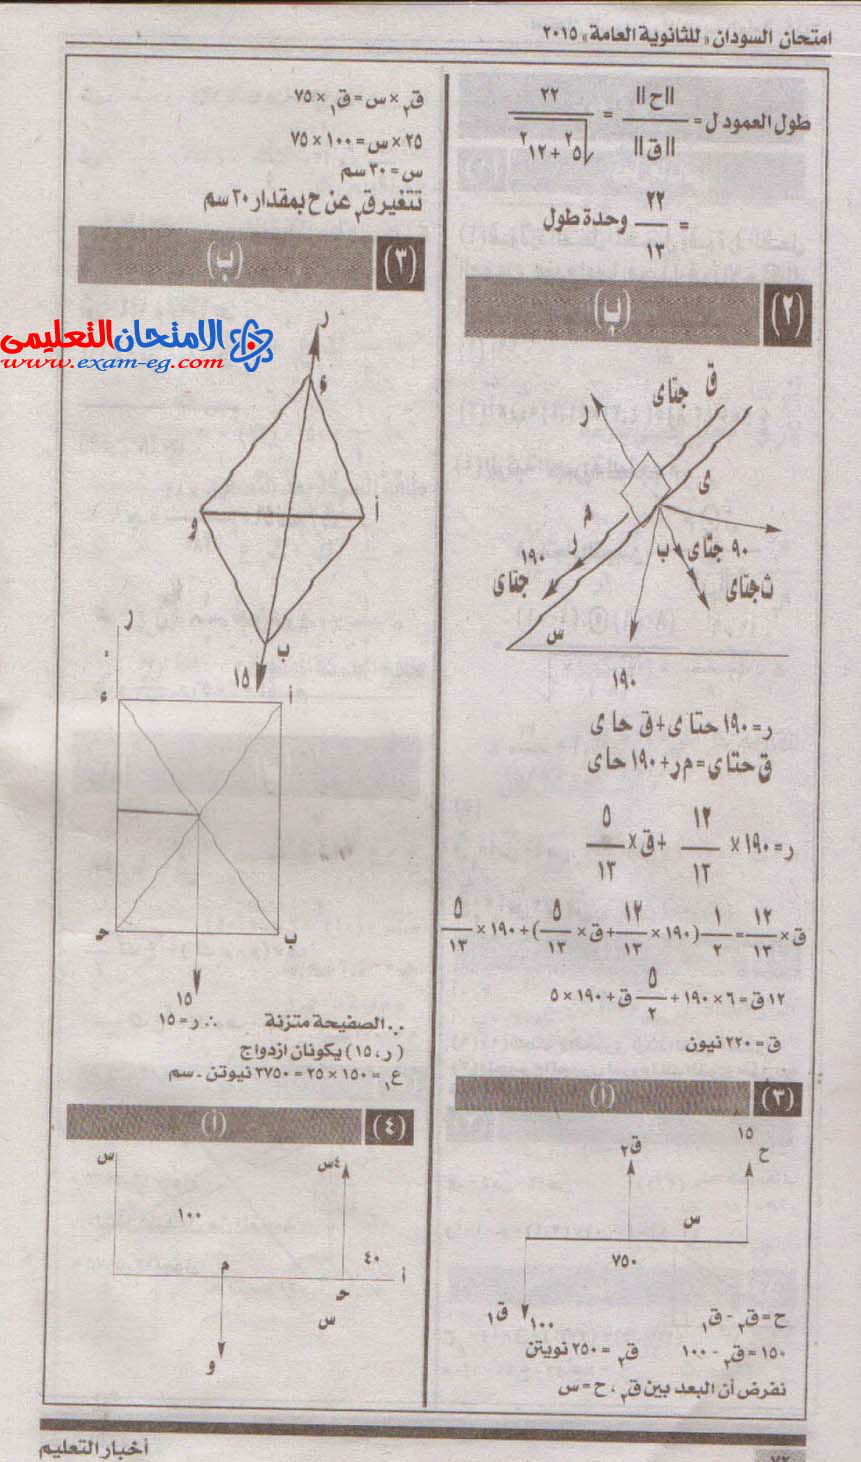 exam-eg.com_1429847573344.jpg